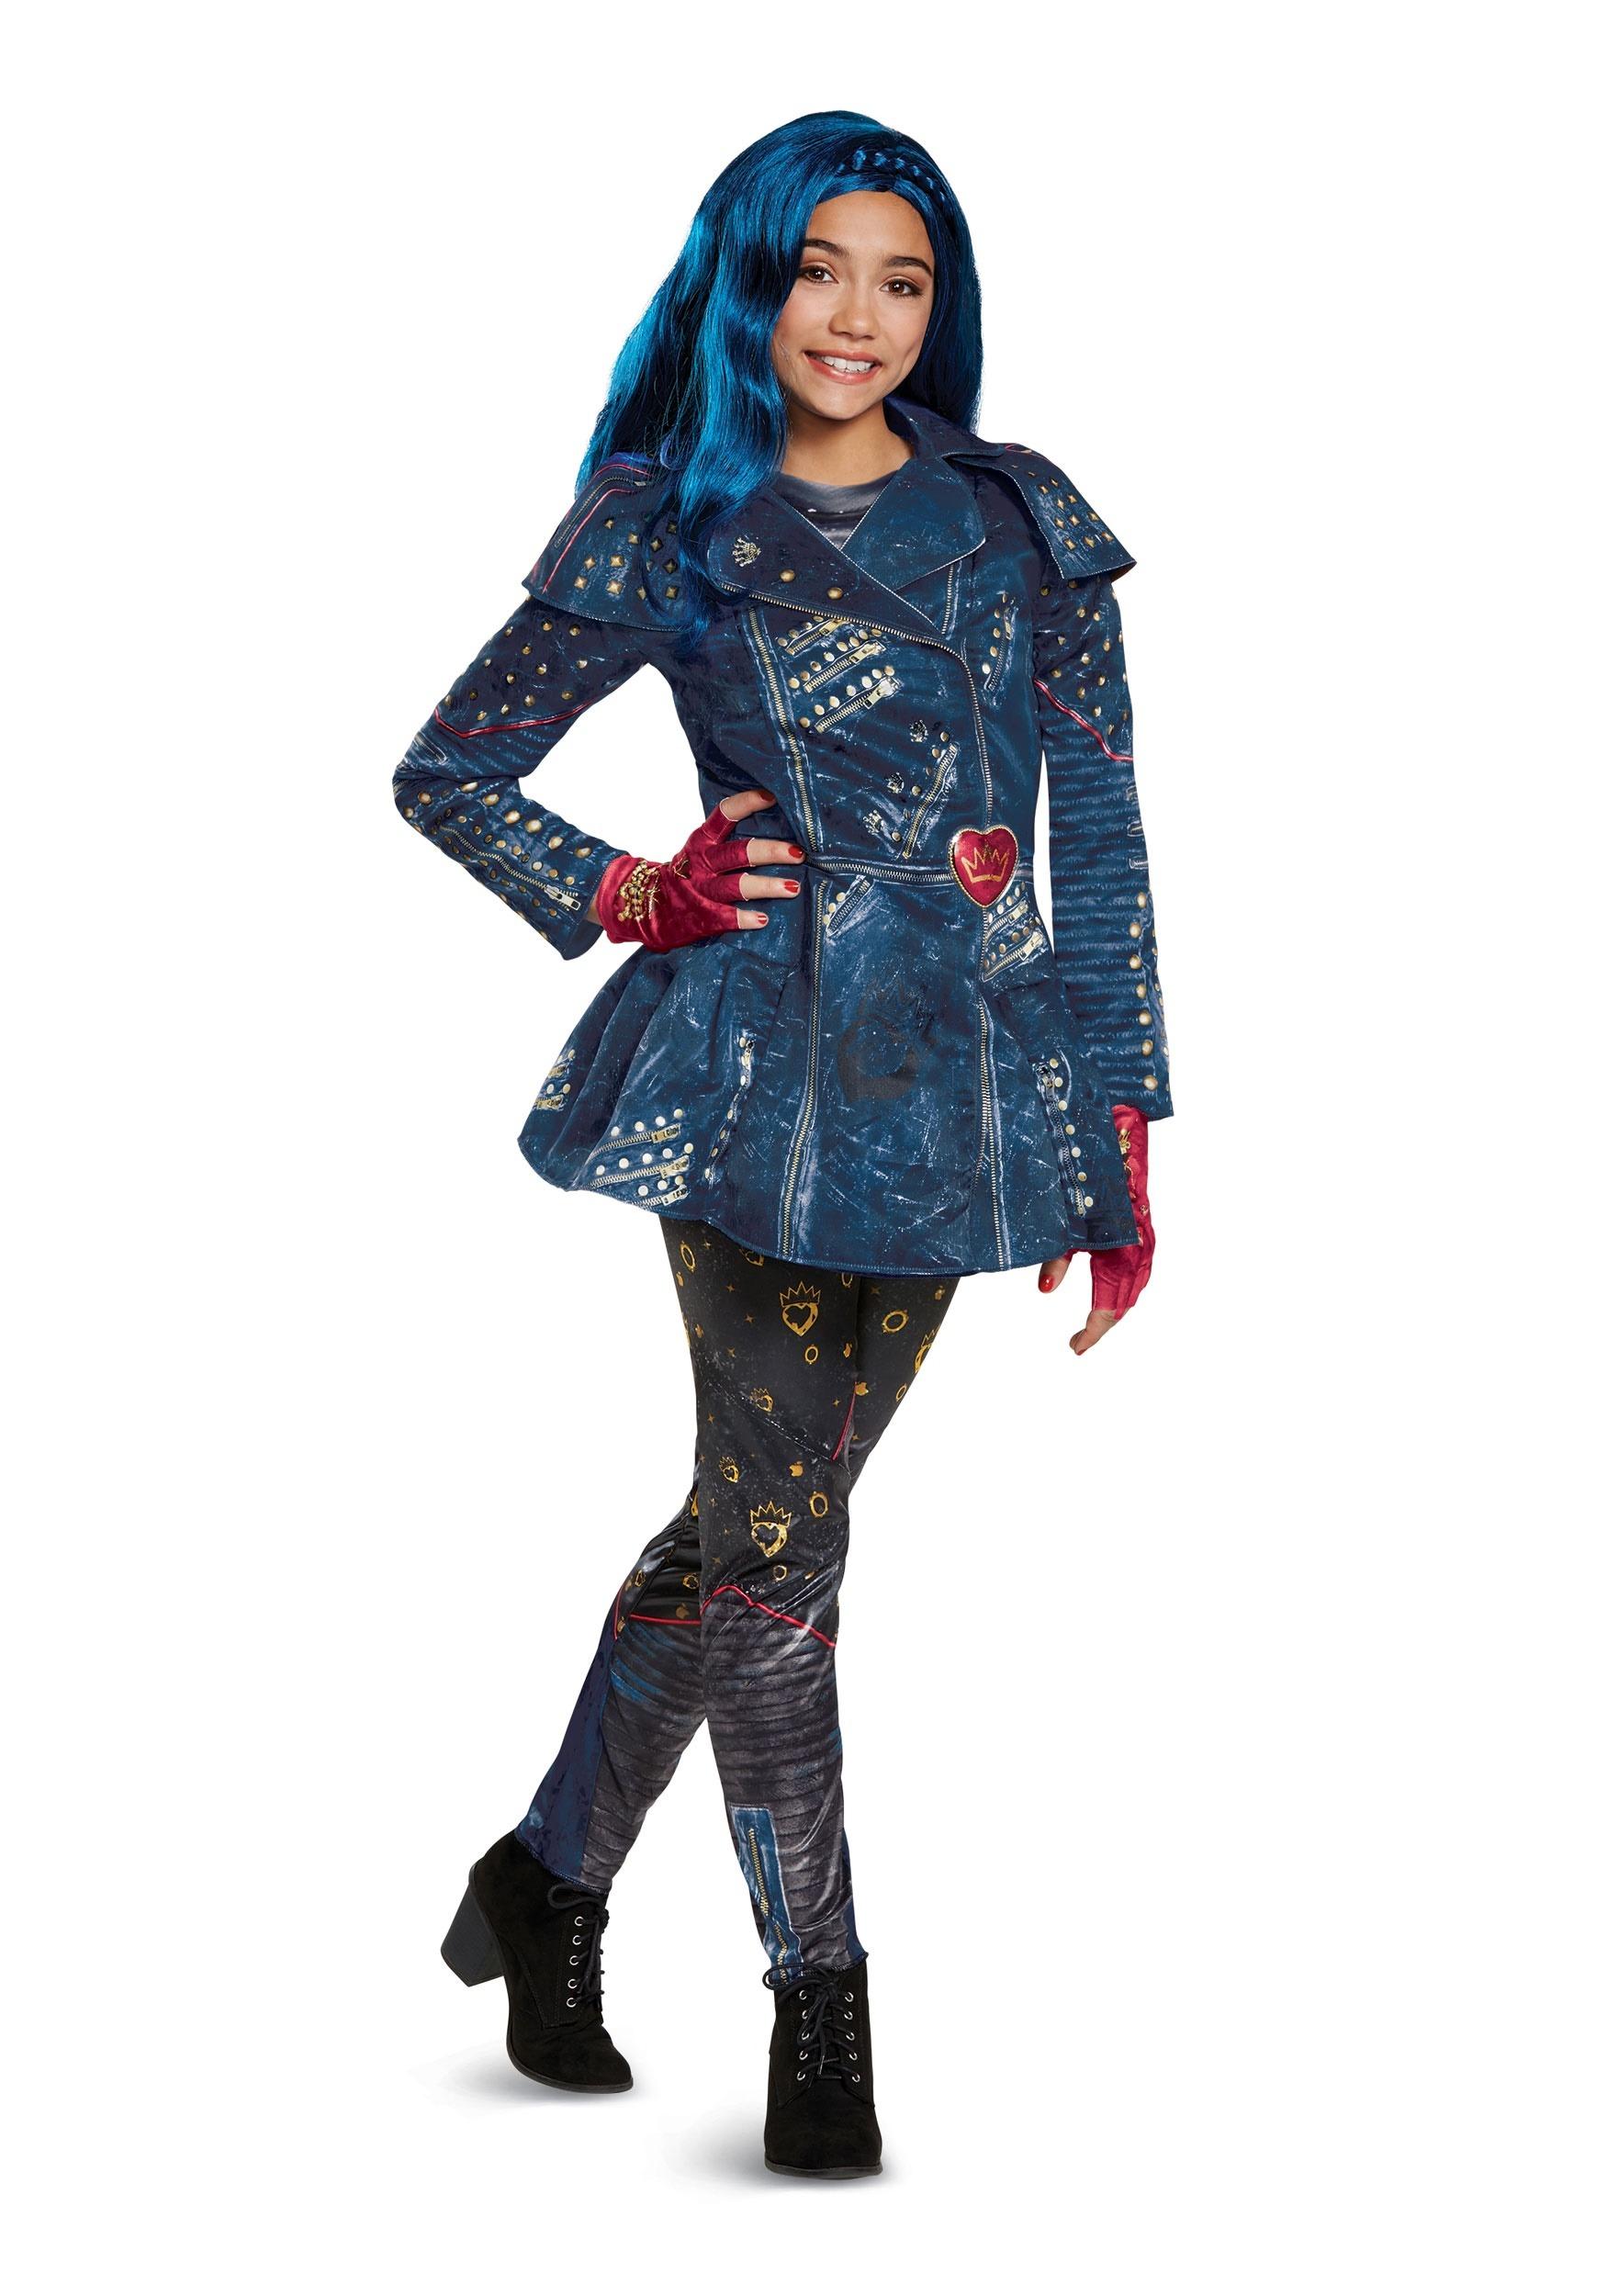 Disney Descendants 2 Evie costume